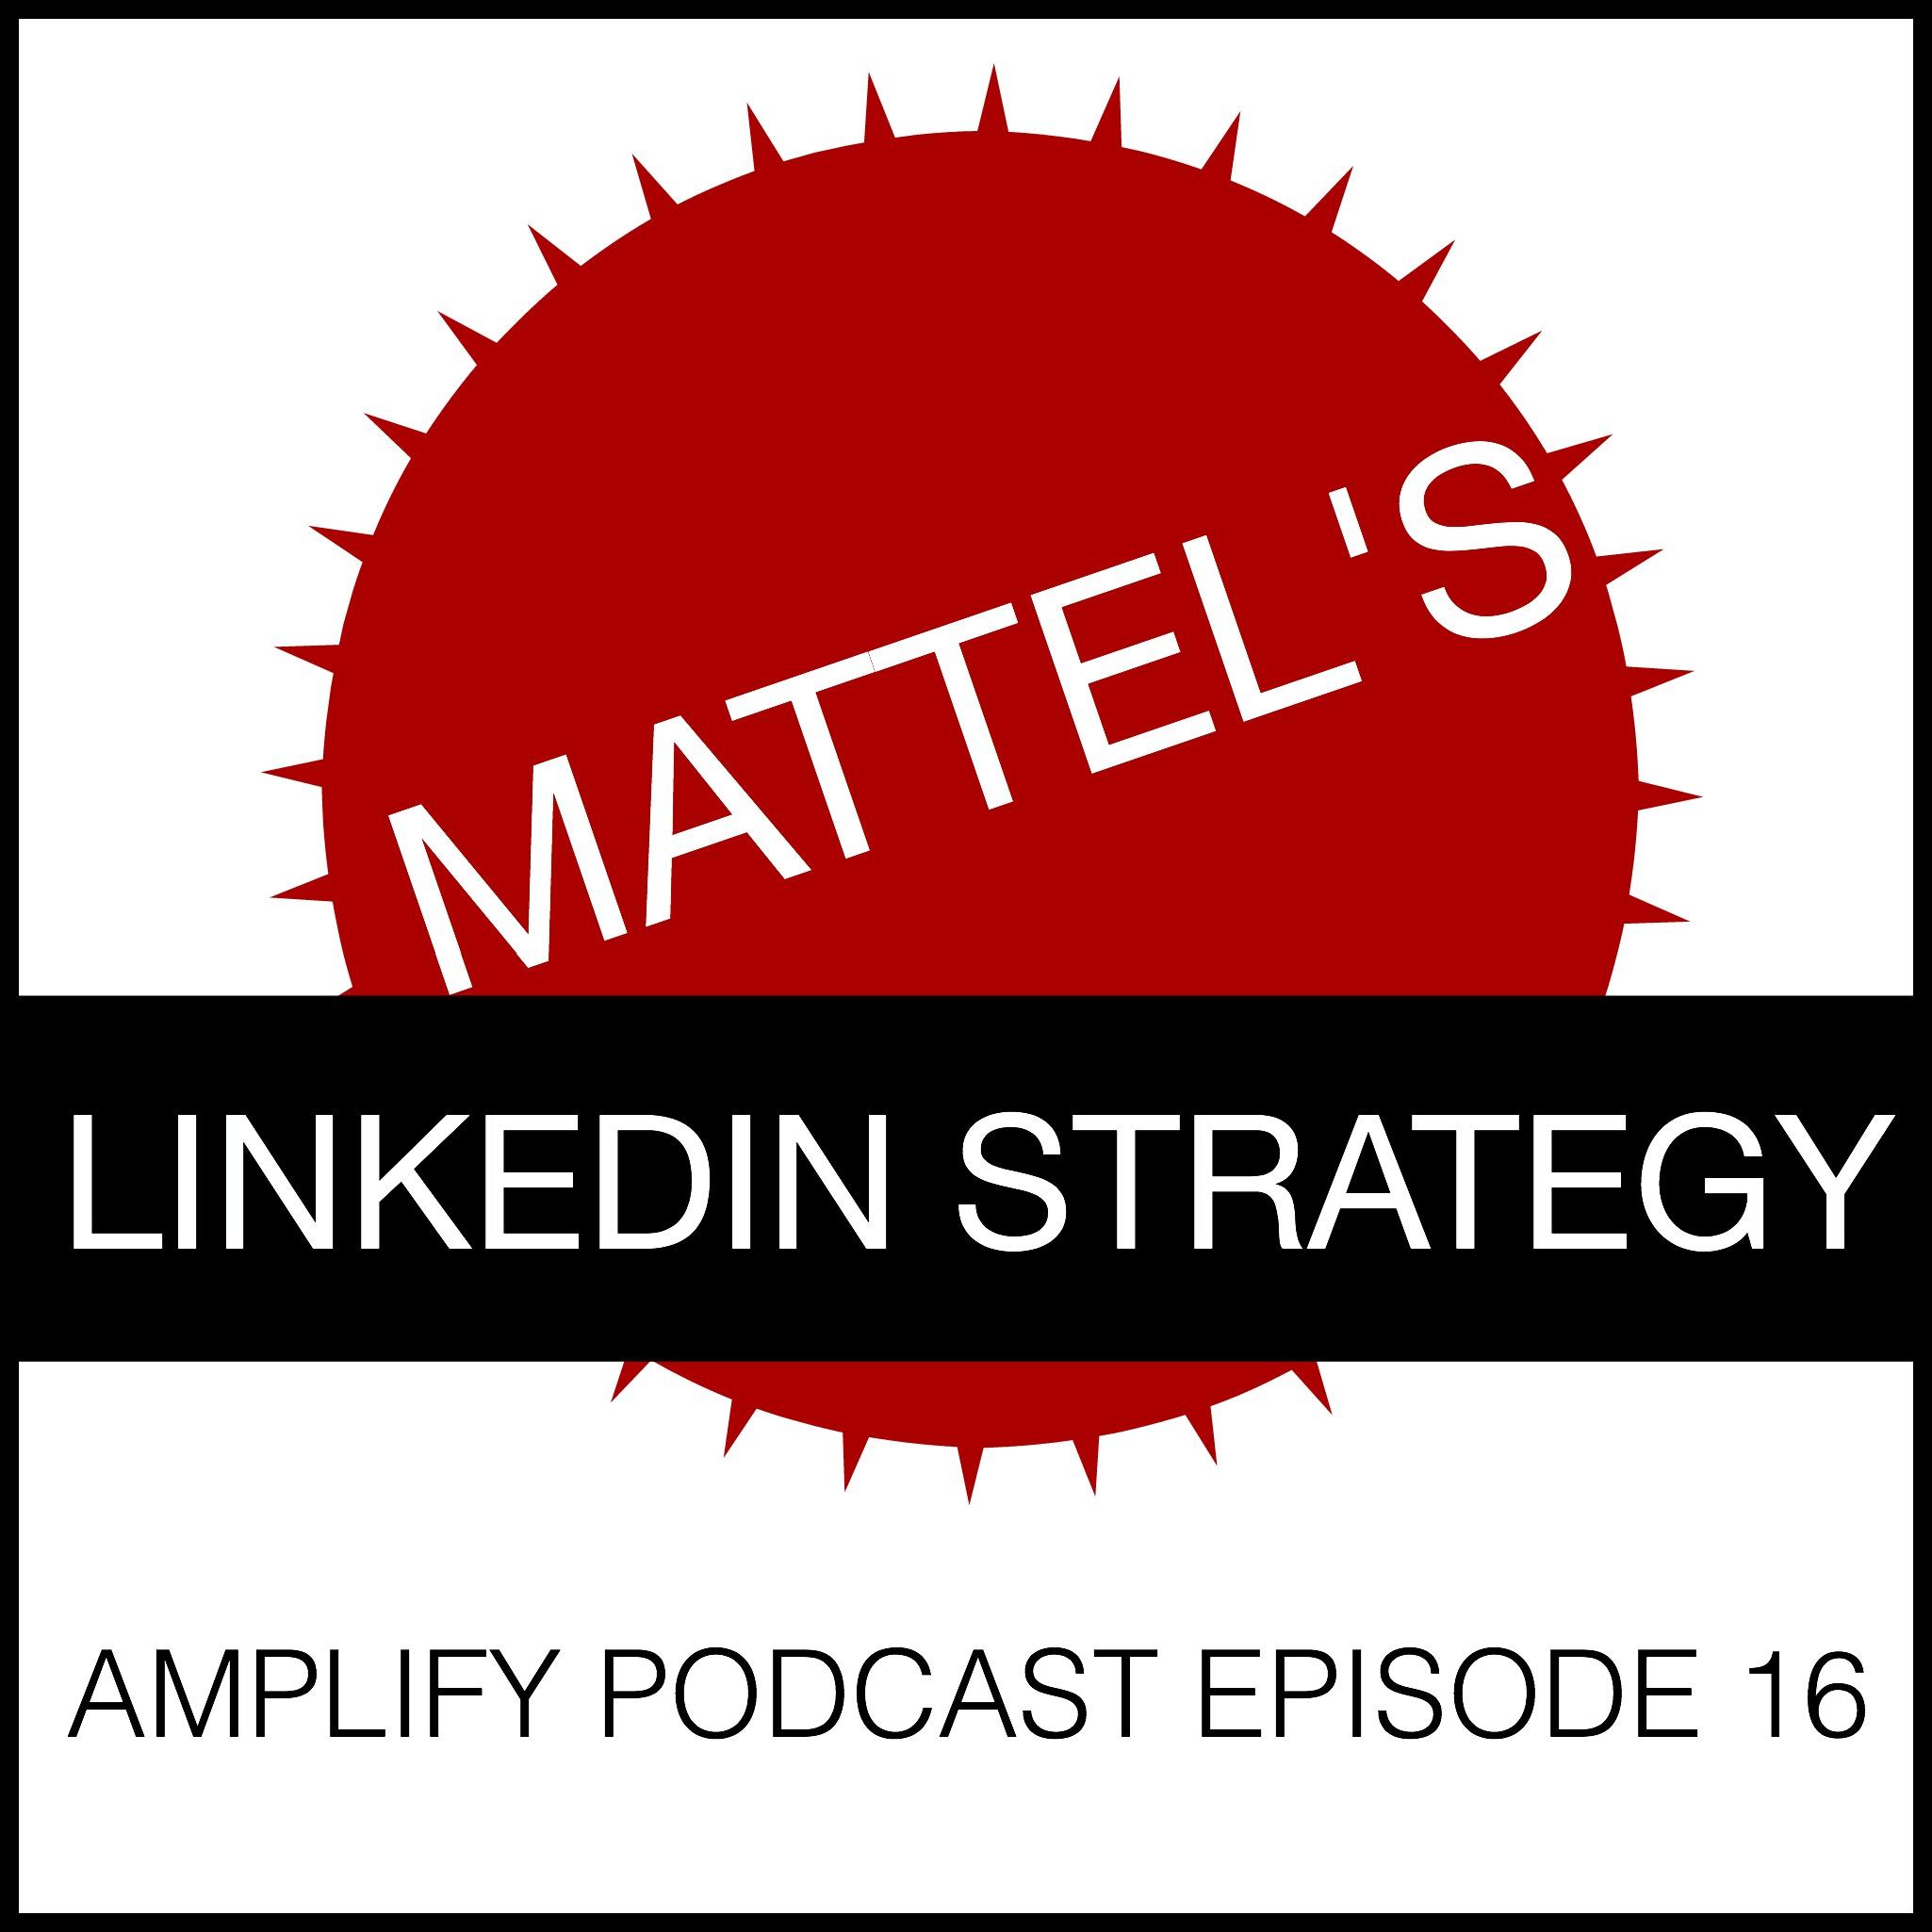 Mattel's LinkedIn Strategy